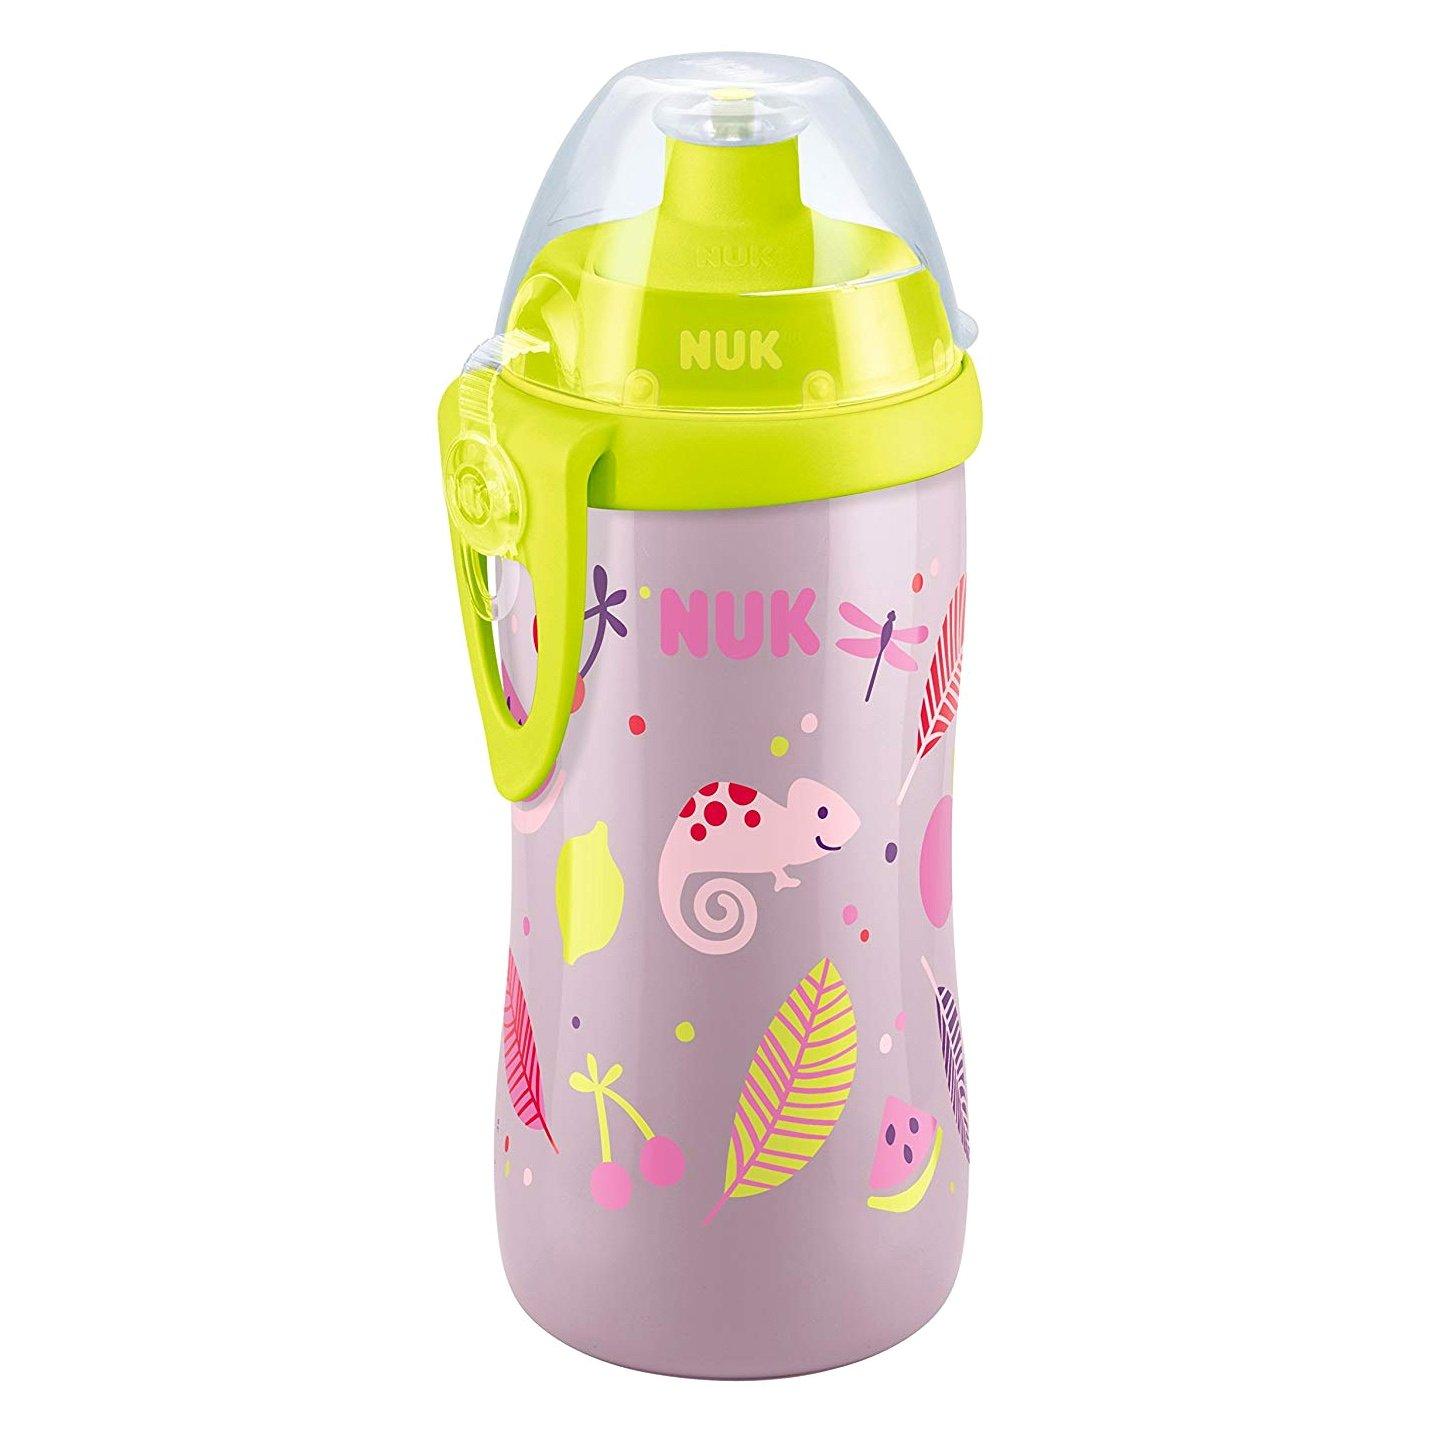 Nuk Παγουράκι Junior Cup με Καπάκι Push-Pull 36Μηνών+ , 300ml – ροζ